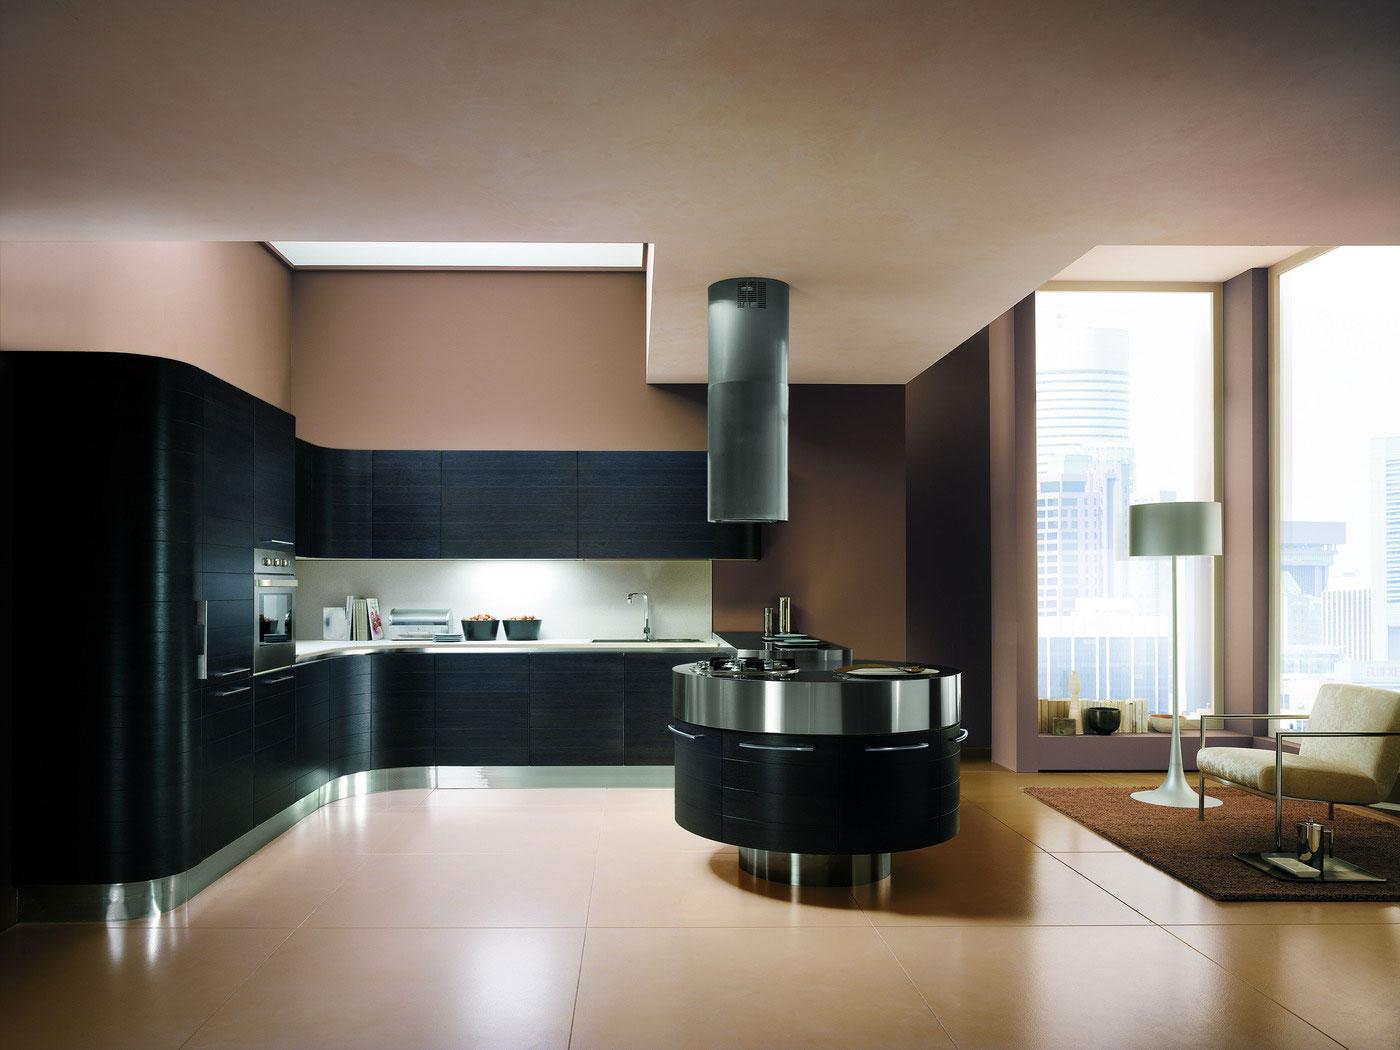 Cuisine Design De Luxe - Evejoy.top